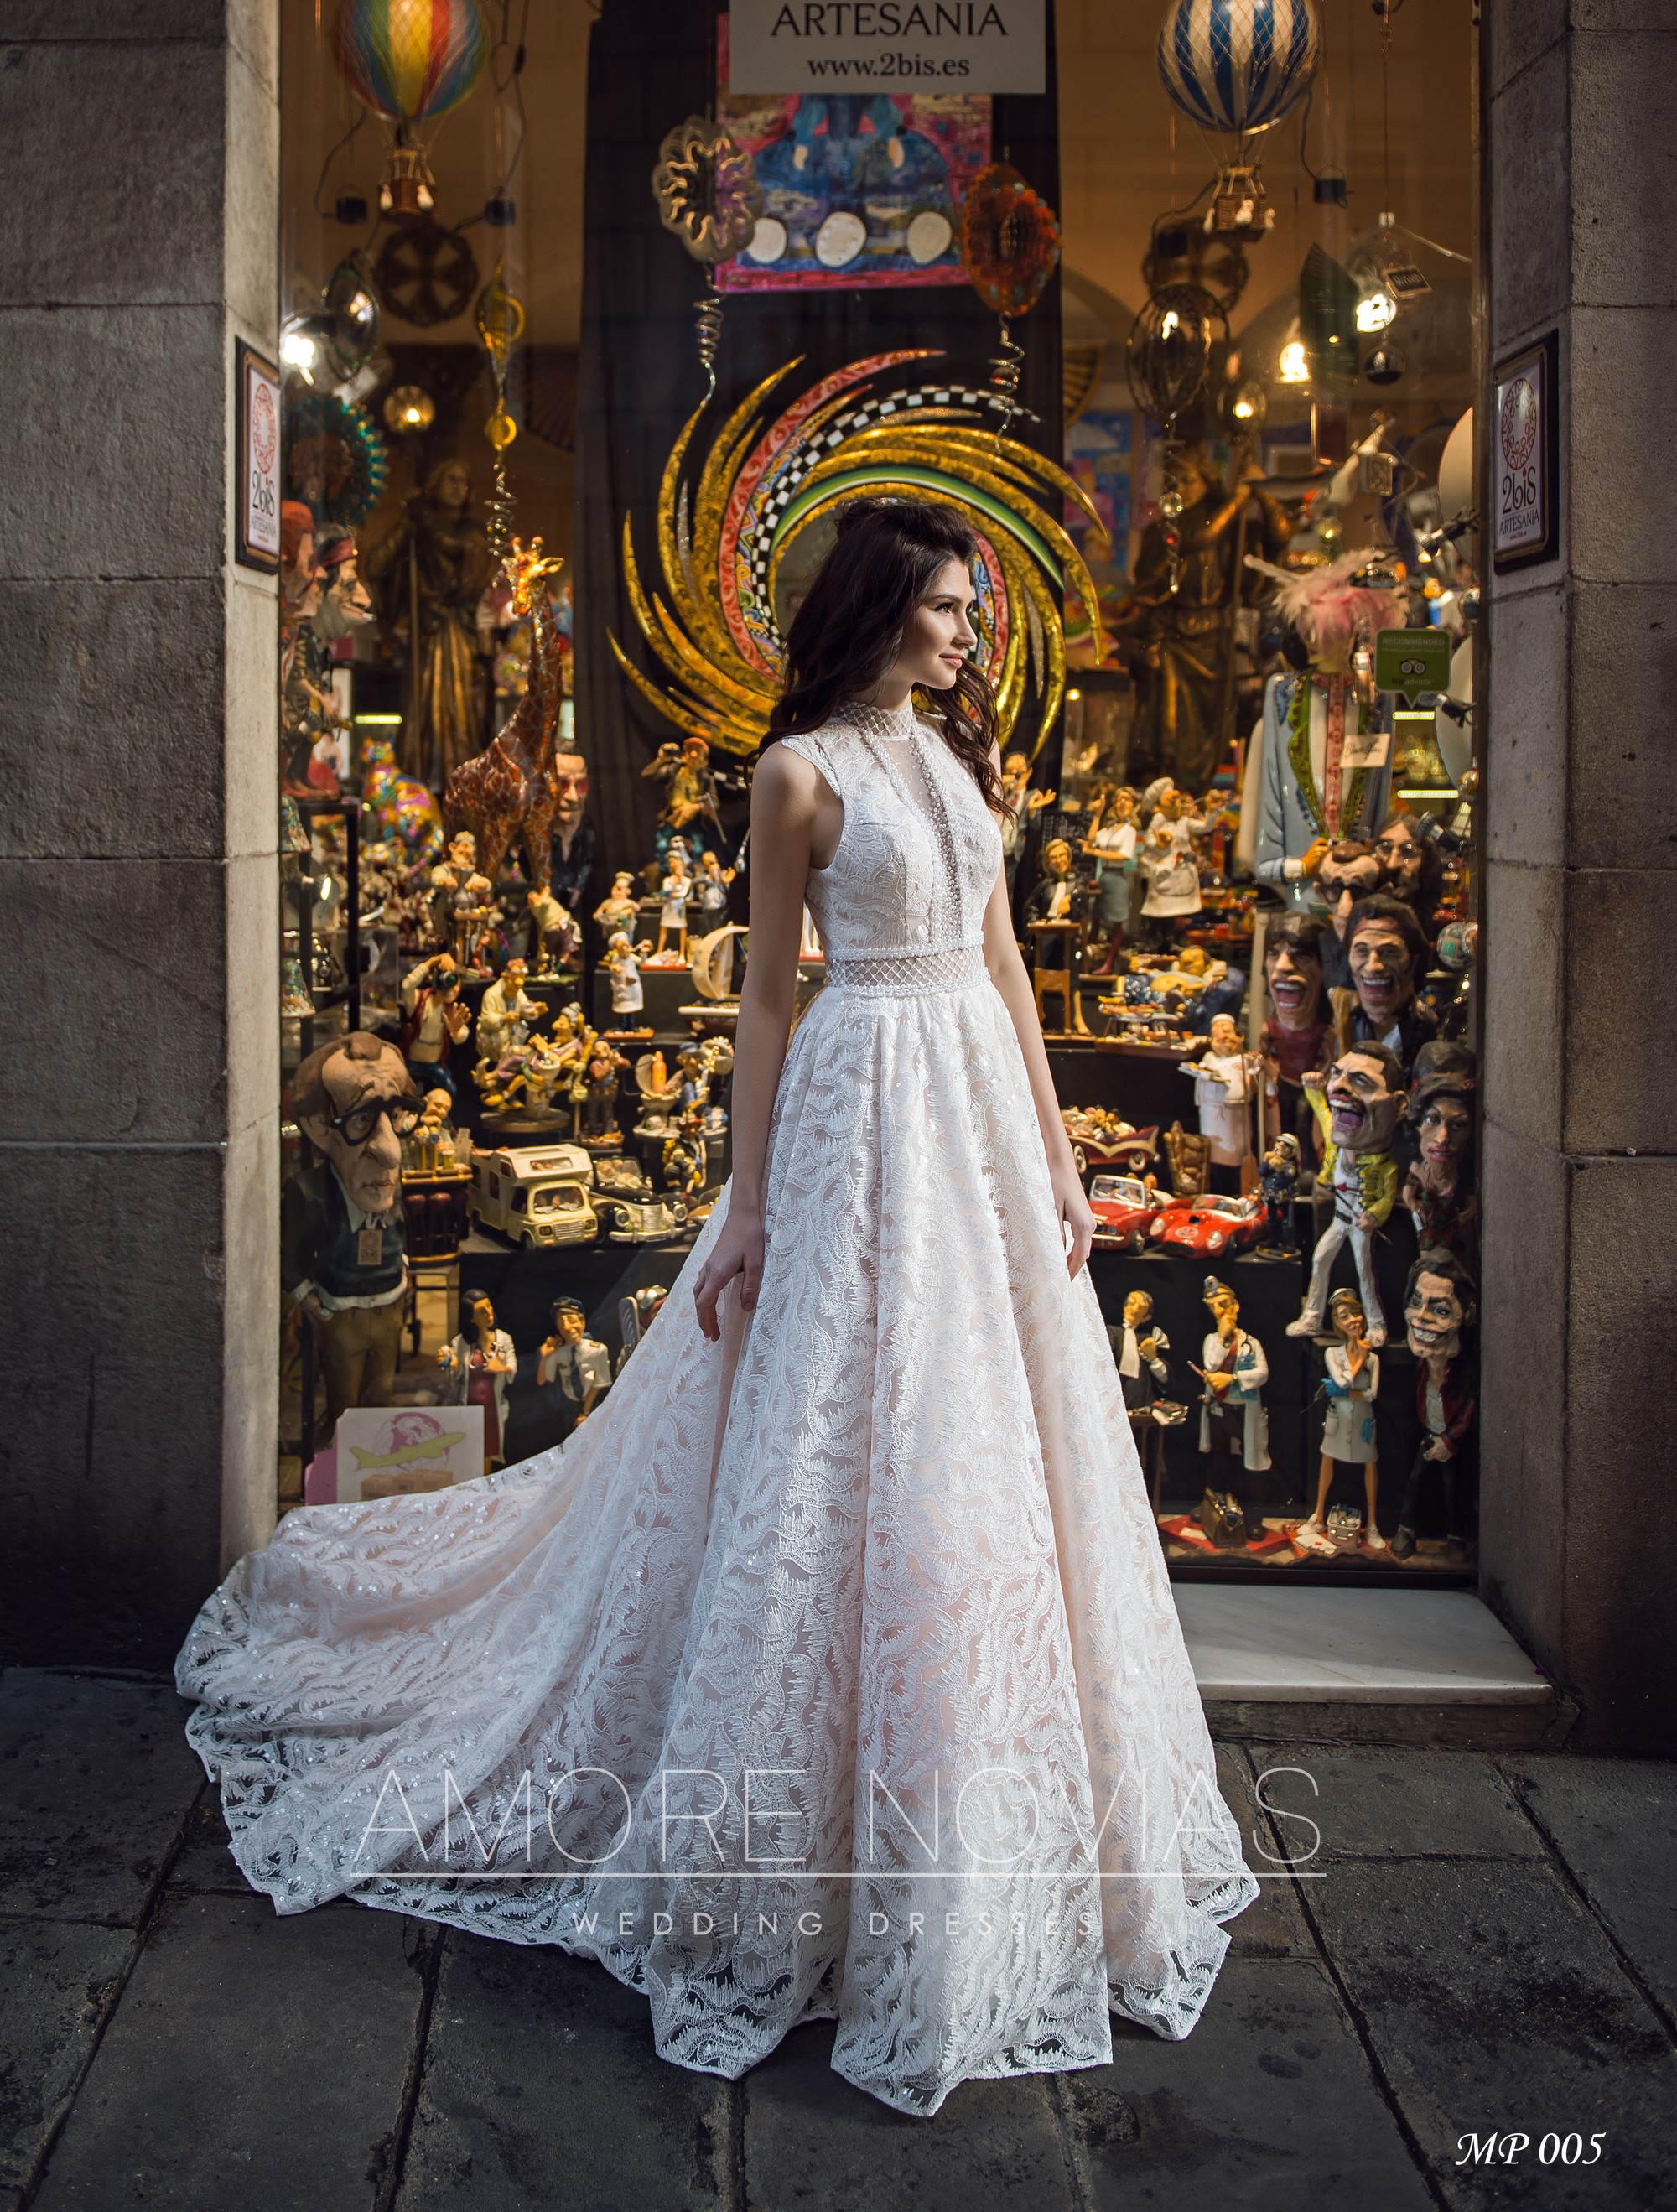 http://amore-novias.com/images/stories/virtuemart/product/mp-005-------(1).jpg